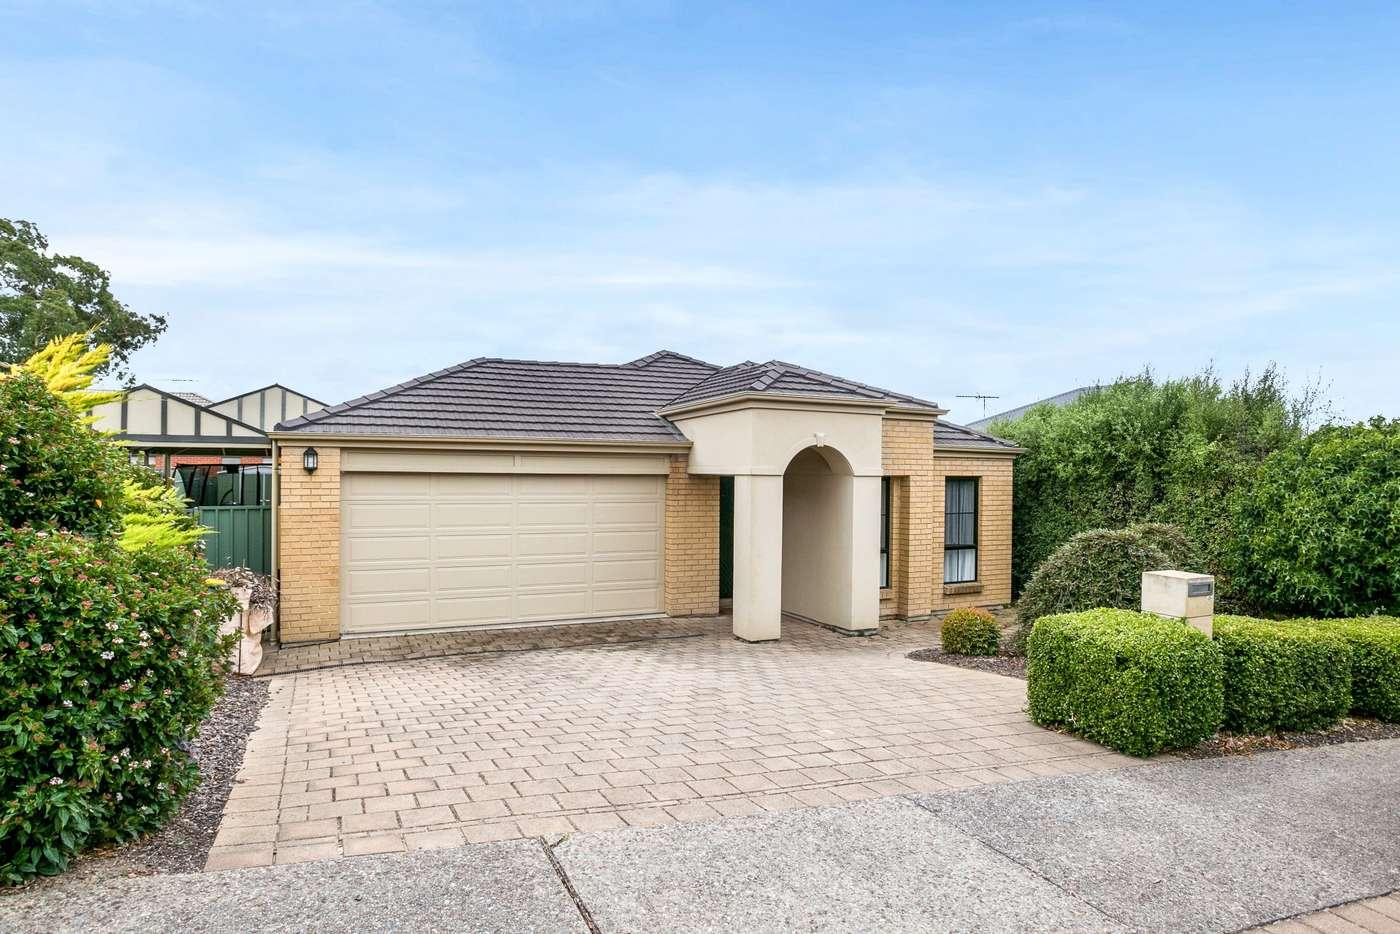 Main view of Homely house listing, 46 Barton Circuit, Mount Barker SA 5251